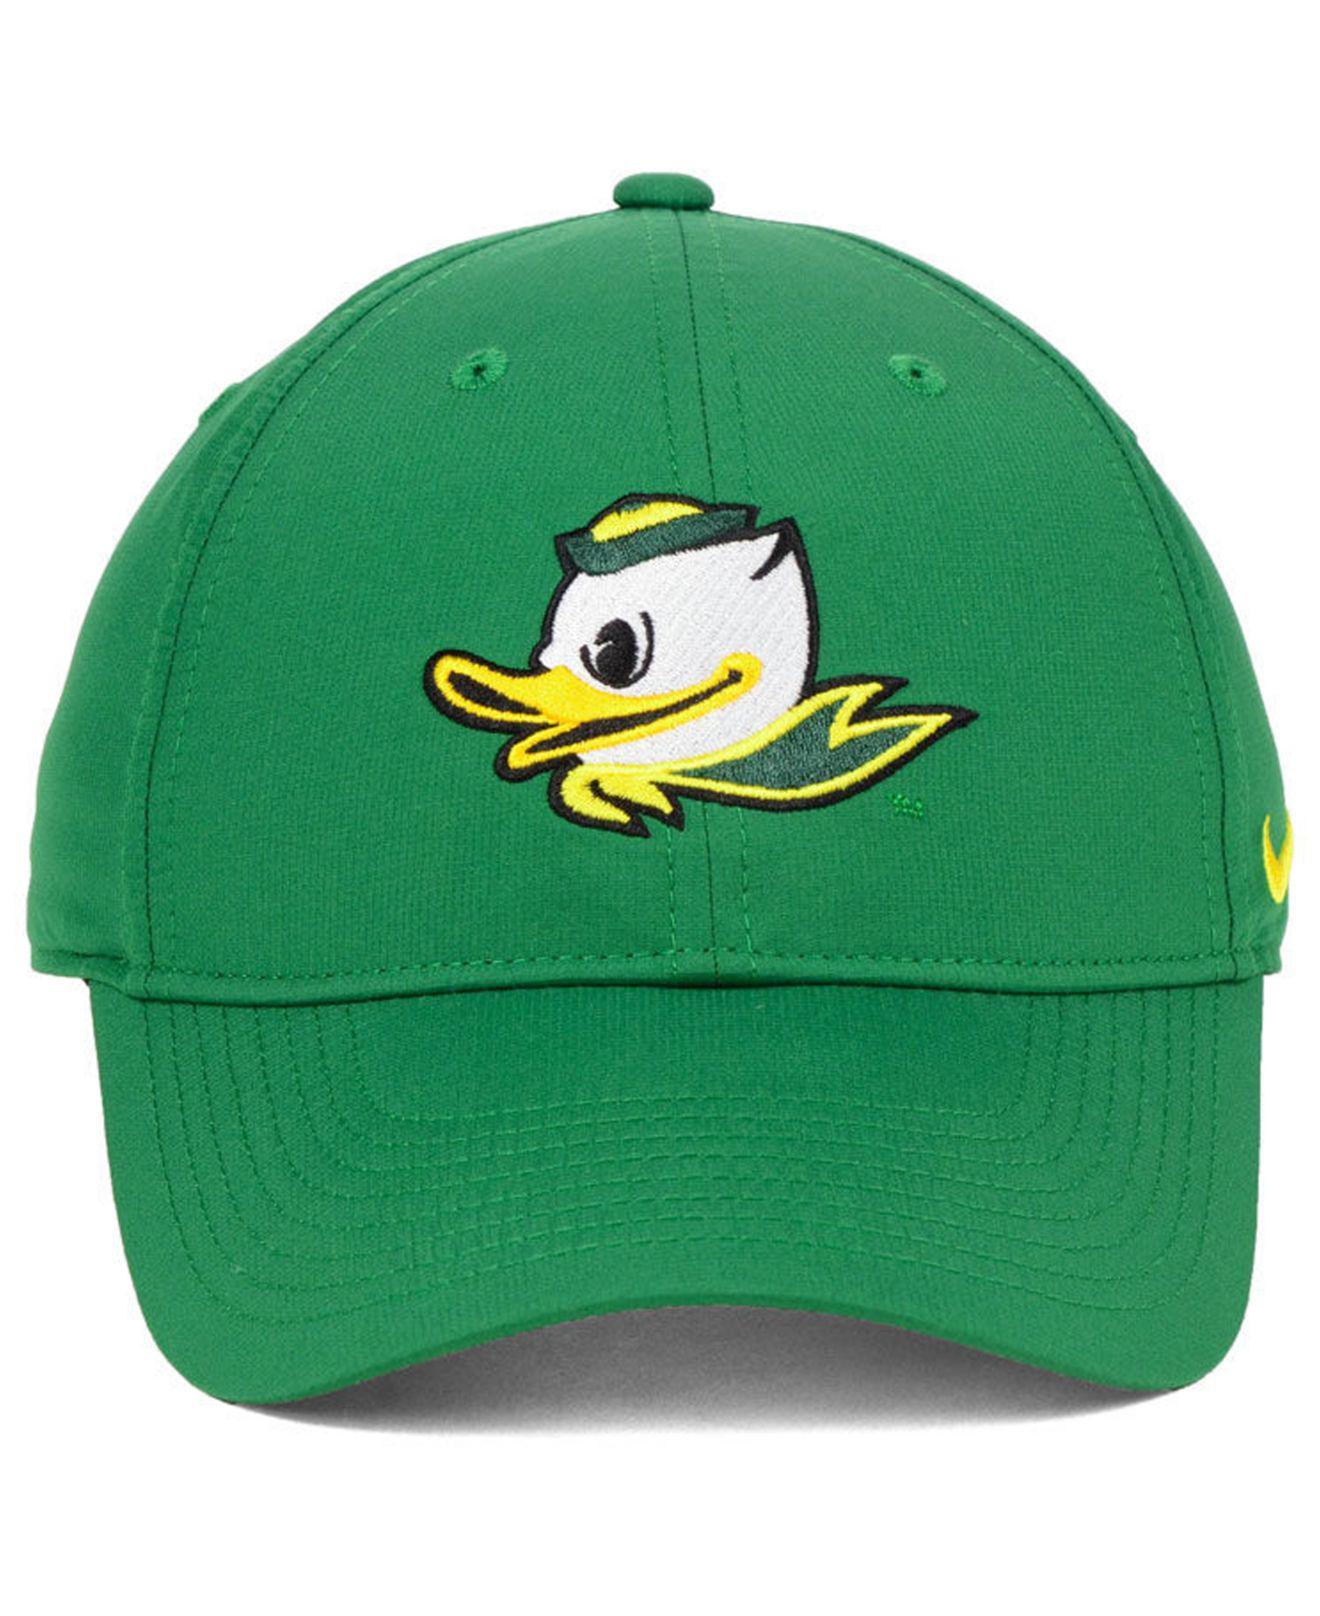 pretty nice f00d2 52358 Nike Oregon Ducks Dri-fit Adjustable Cap in Green for Men - Lyst